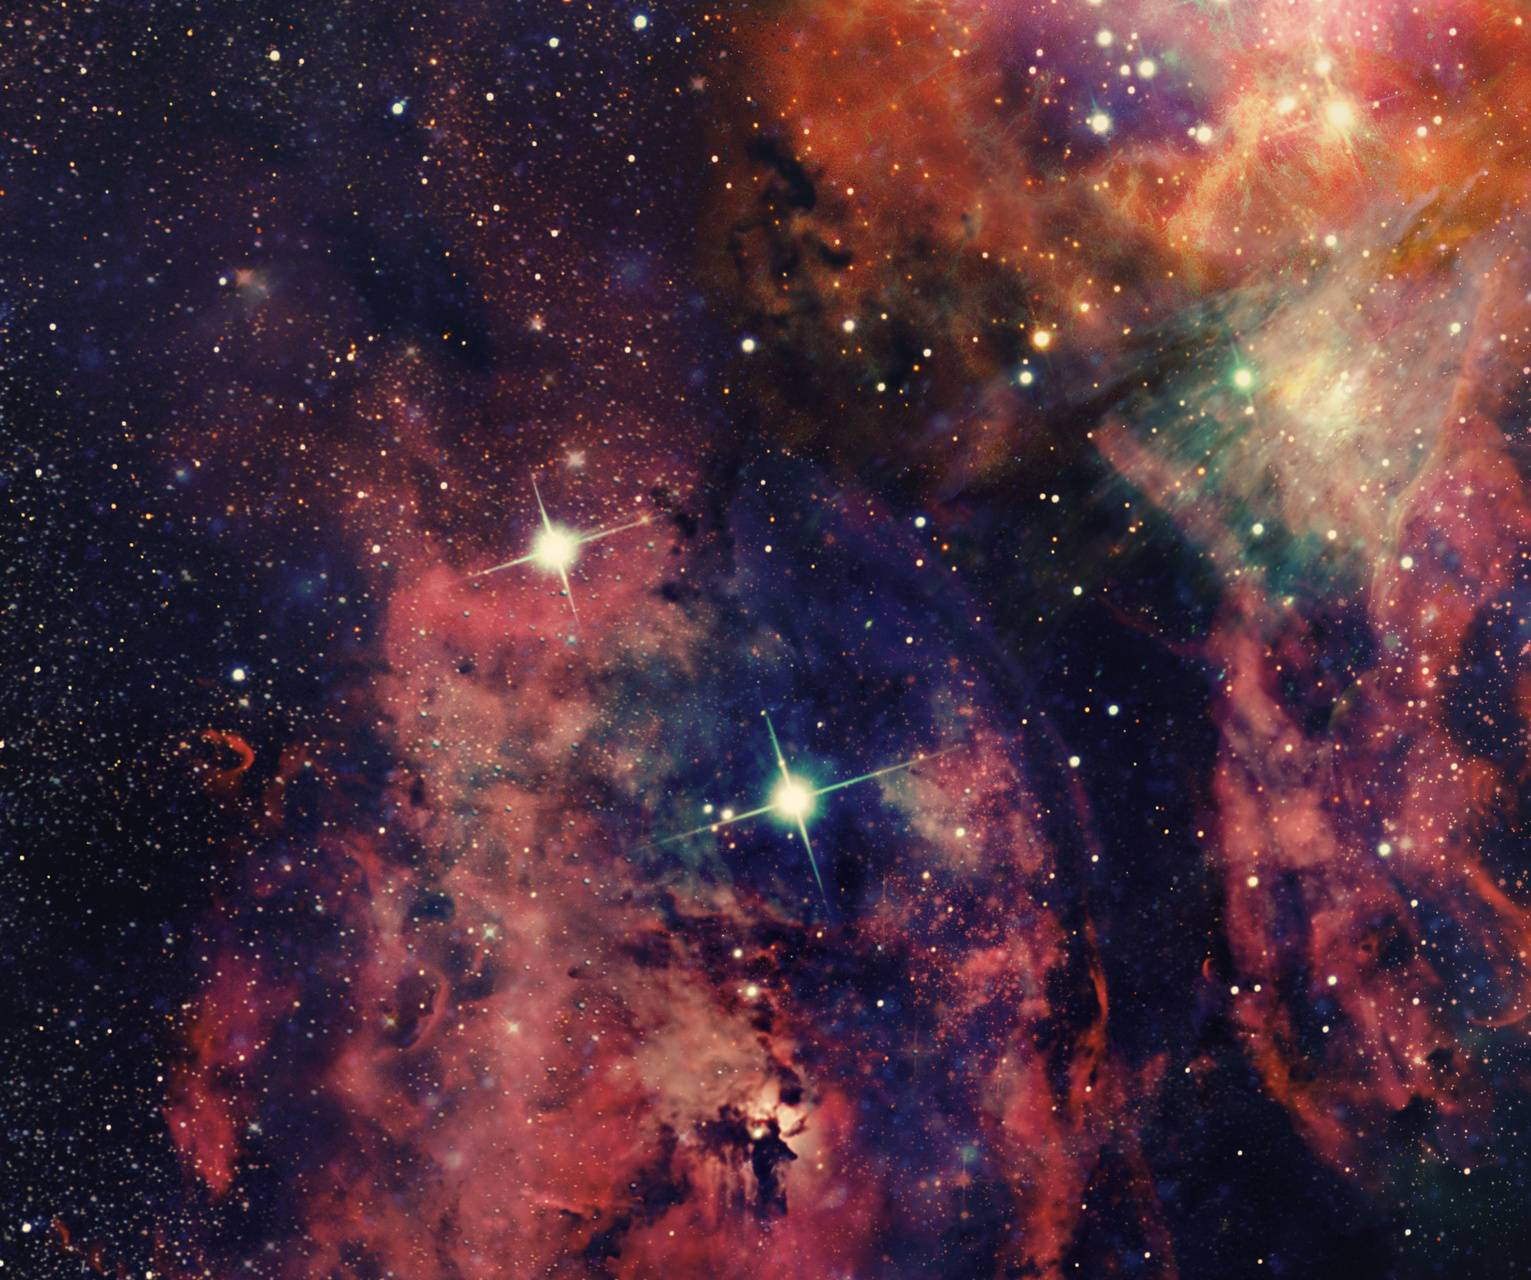 Pinkpurp Nebula